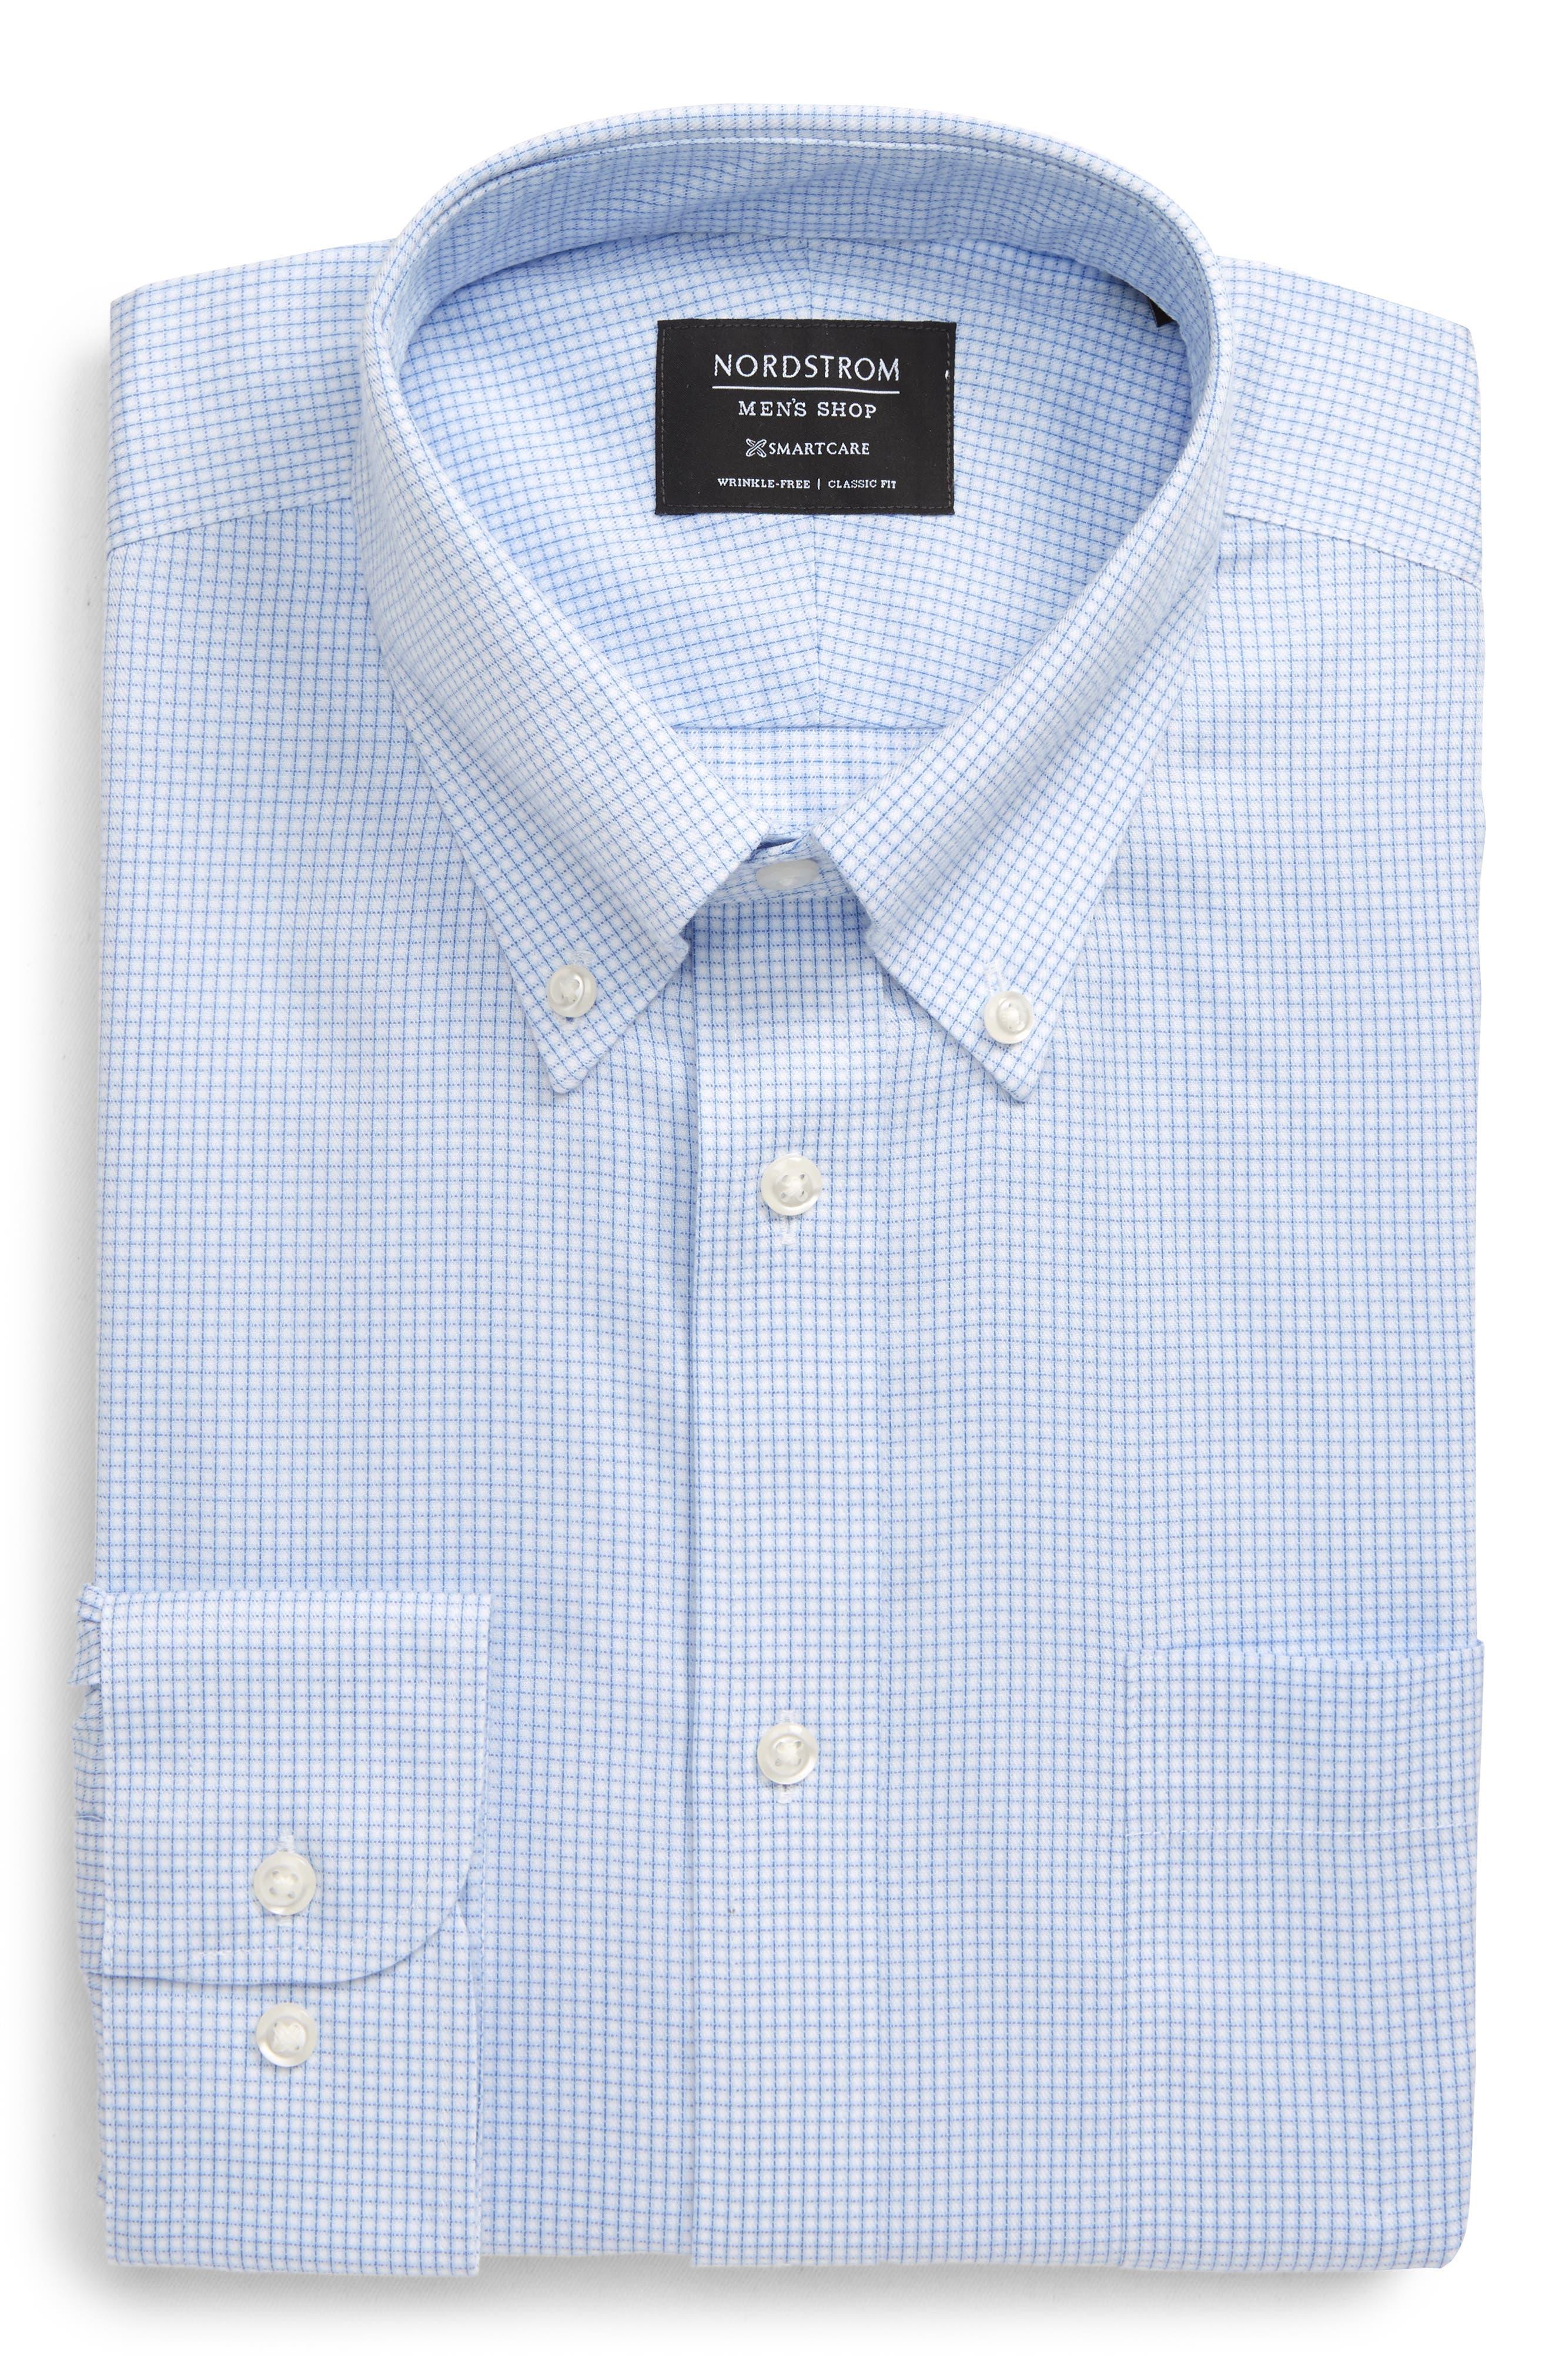 Mens Vintage Shirts – Casual, Dress, T-shirts, Polos Mens Big  Tall Nordstrom Mens Shop SmartcareTM Classic Fit Check Button-Down Dress Shirt Size 19.5 - 3839 - Blue $69.50 AT vintagedancer.com